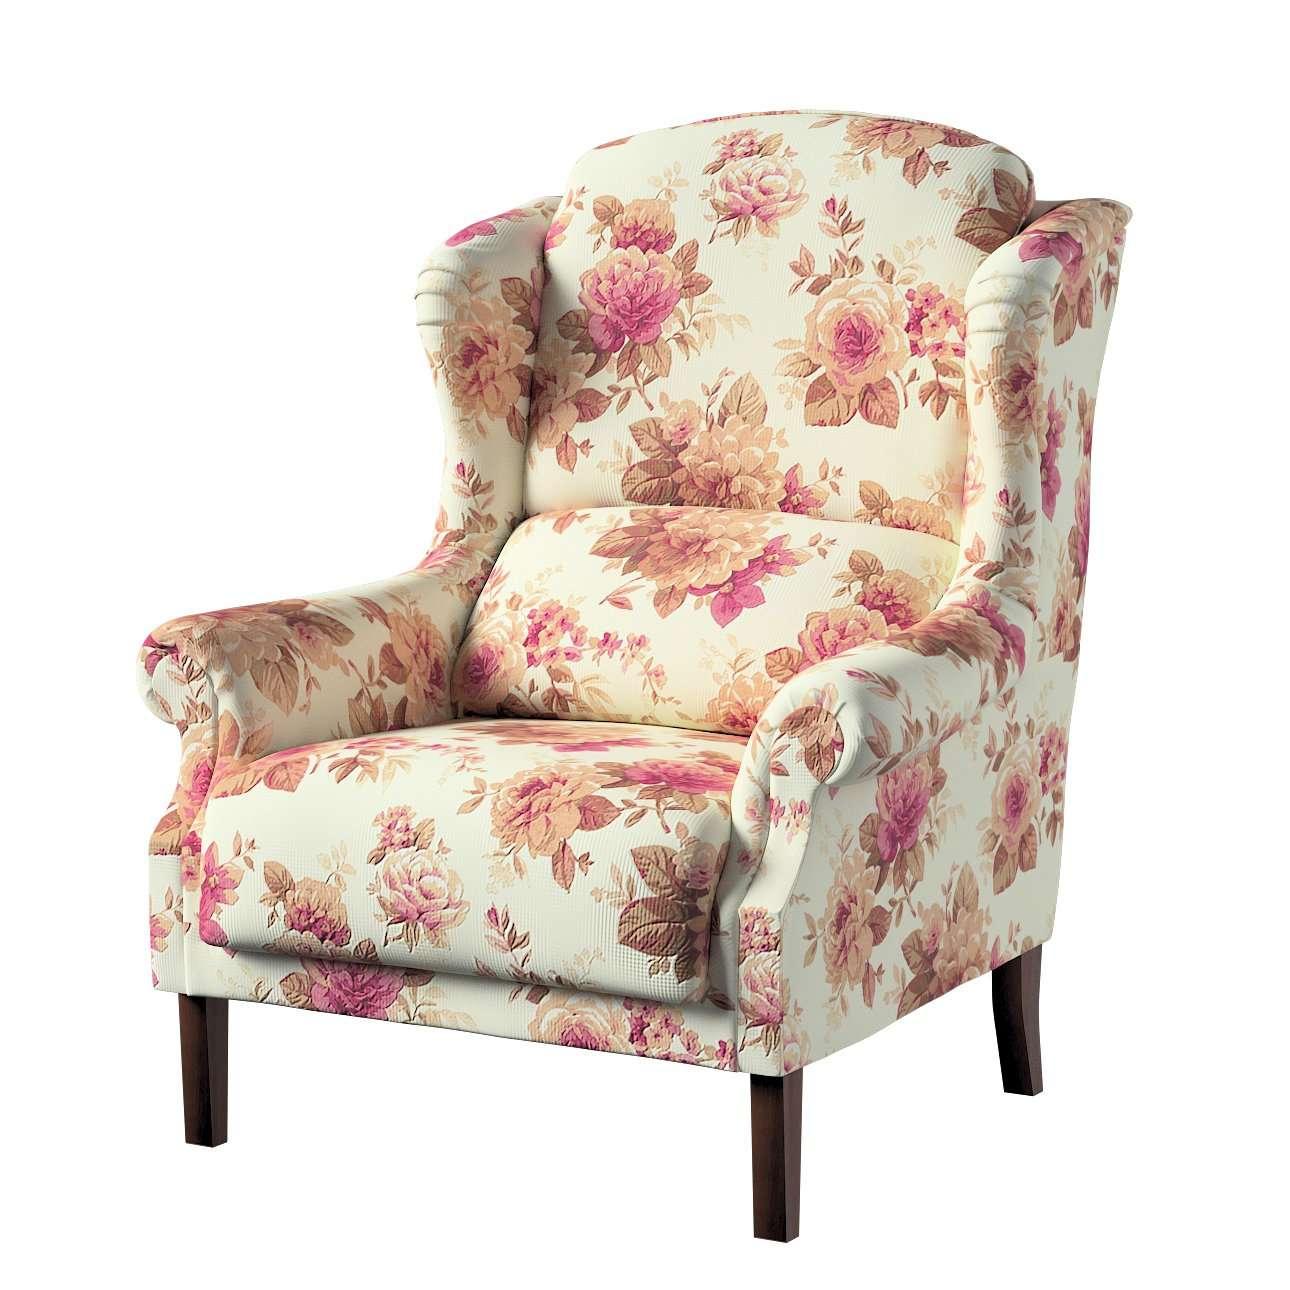 Stilingas Dekoria fotelis 63 x 115 cm kolekcijoje Mirella, audinys: 141-06